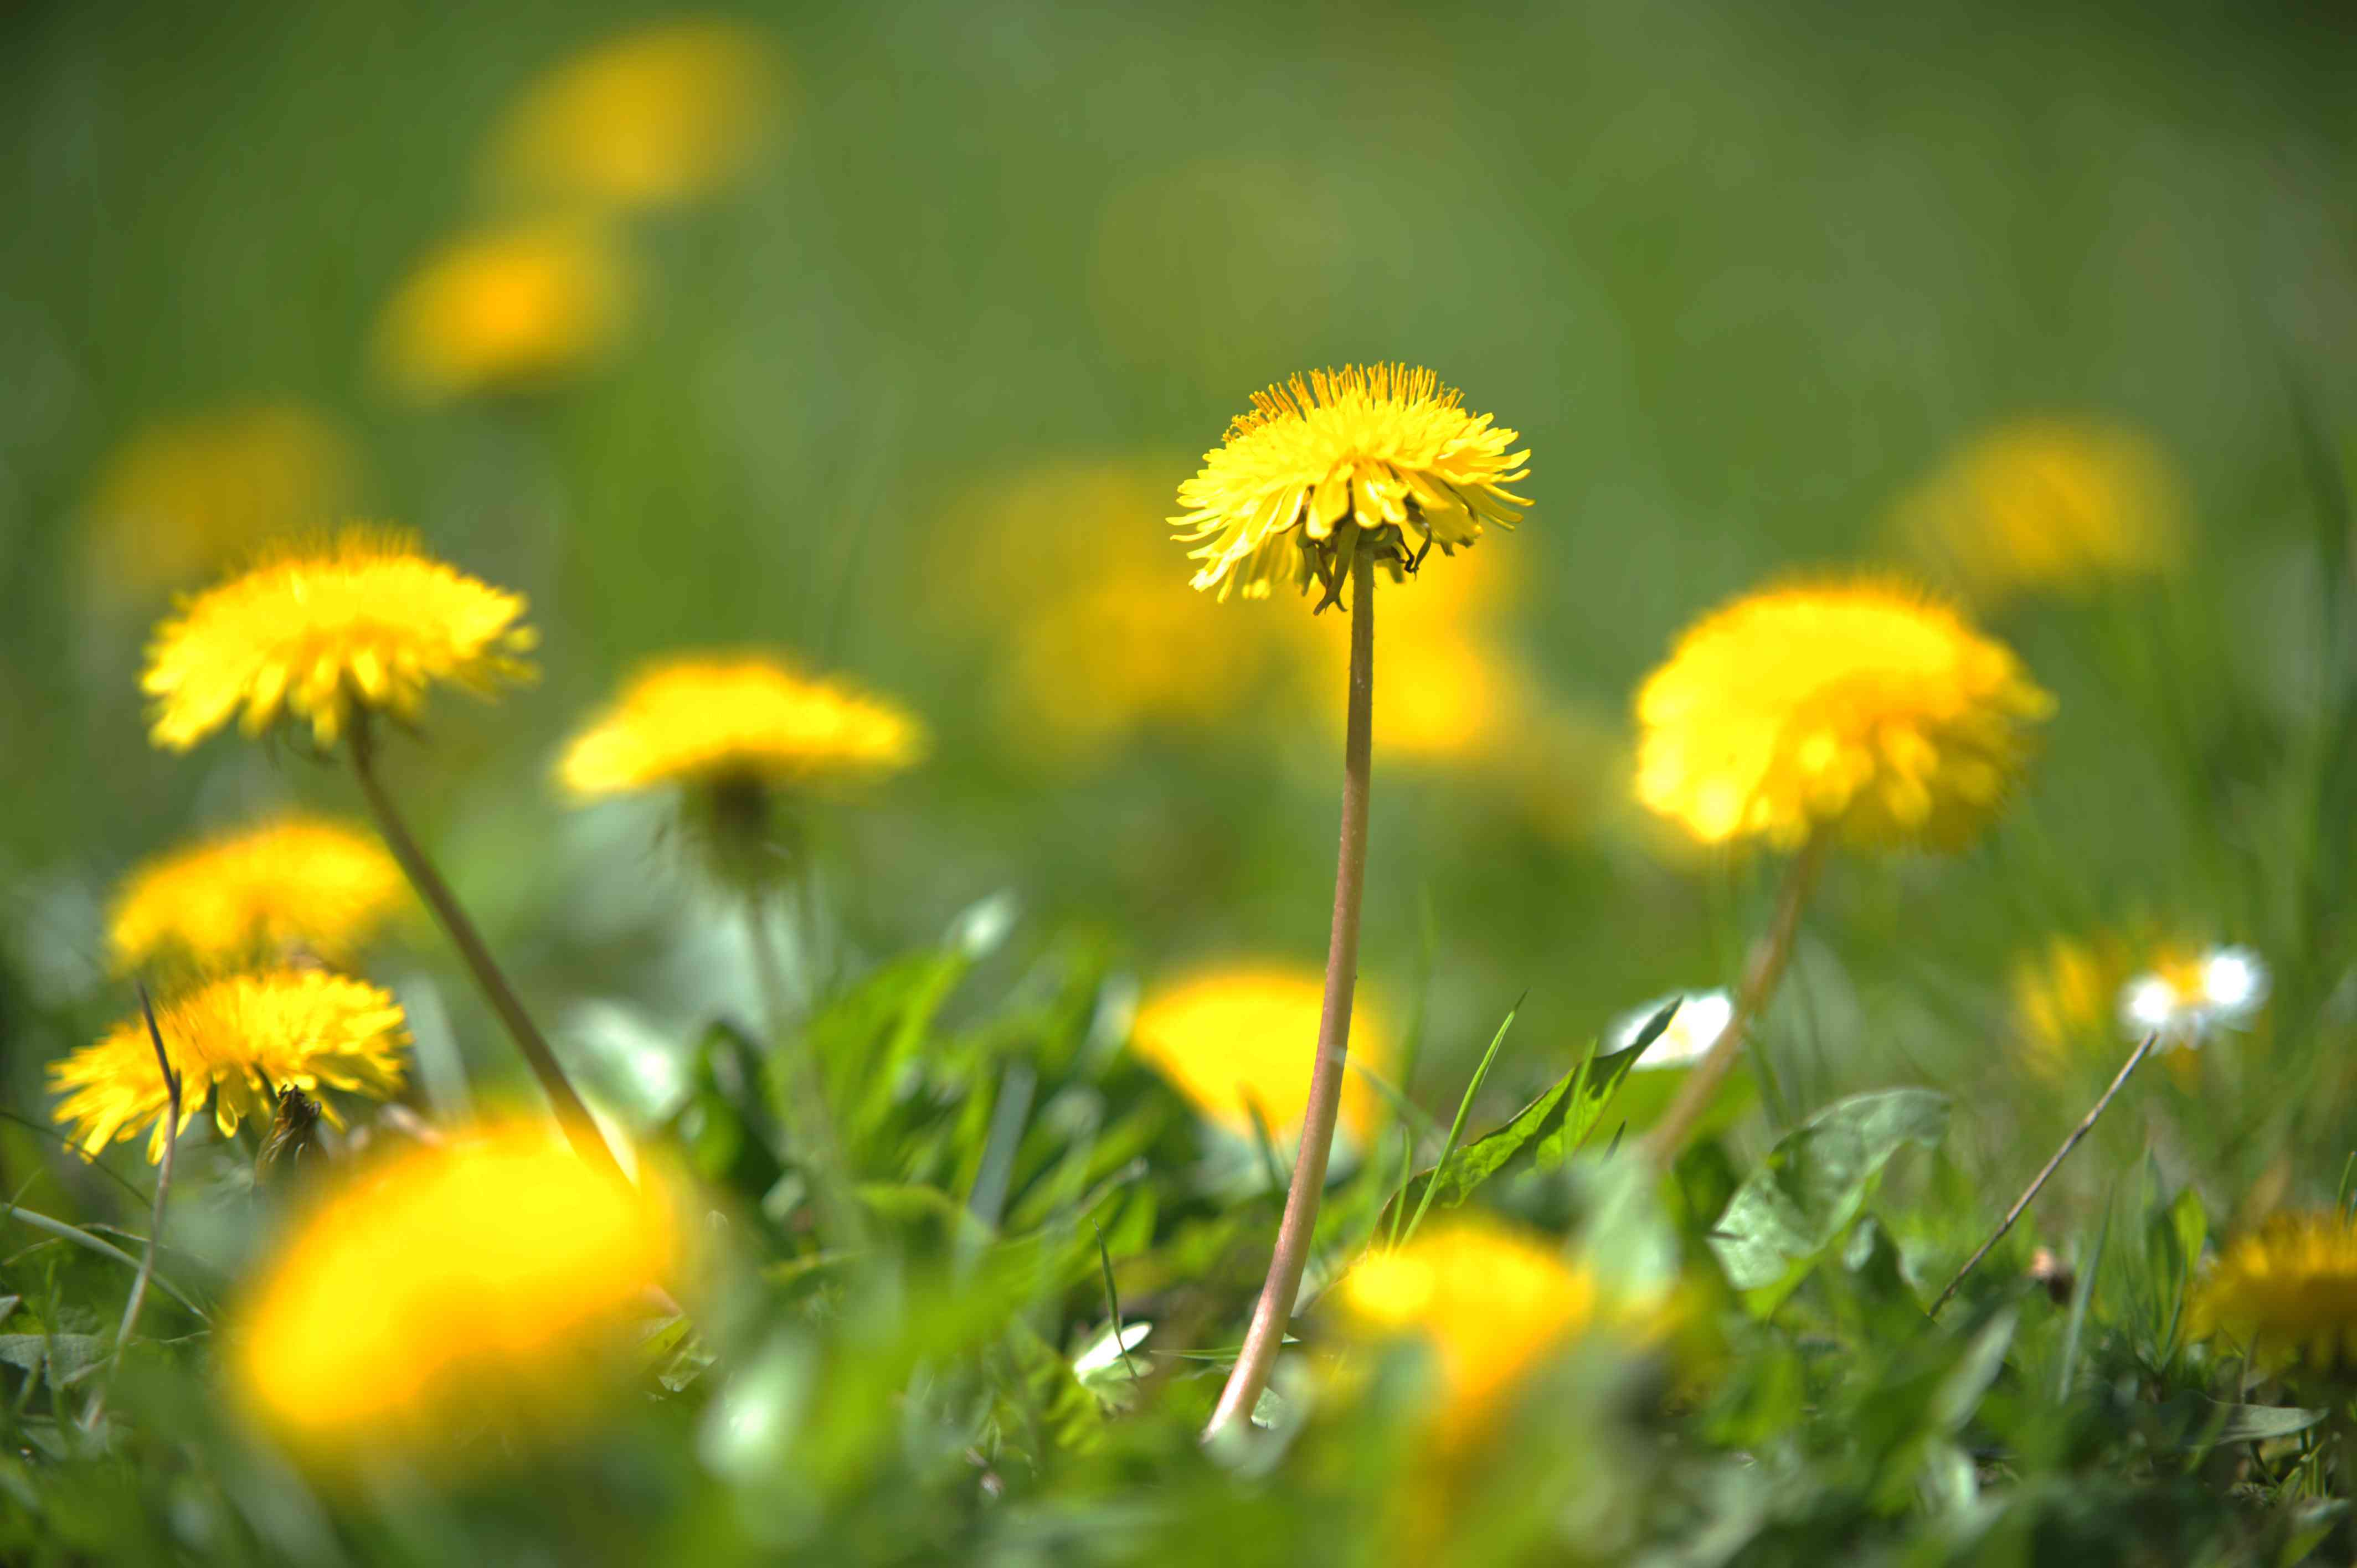 Yellow dandelion flowers in lawn as weed